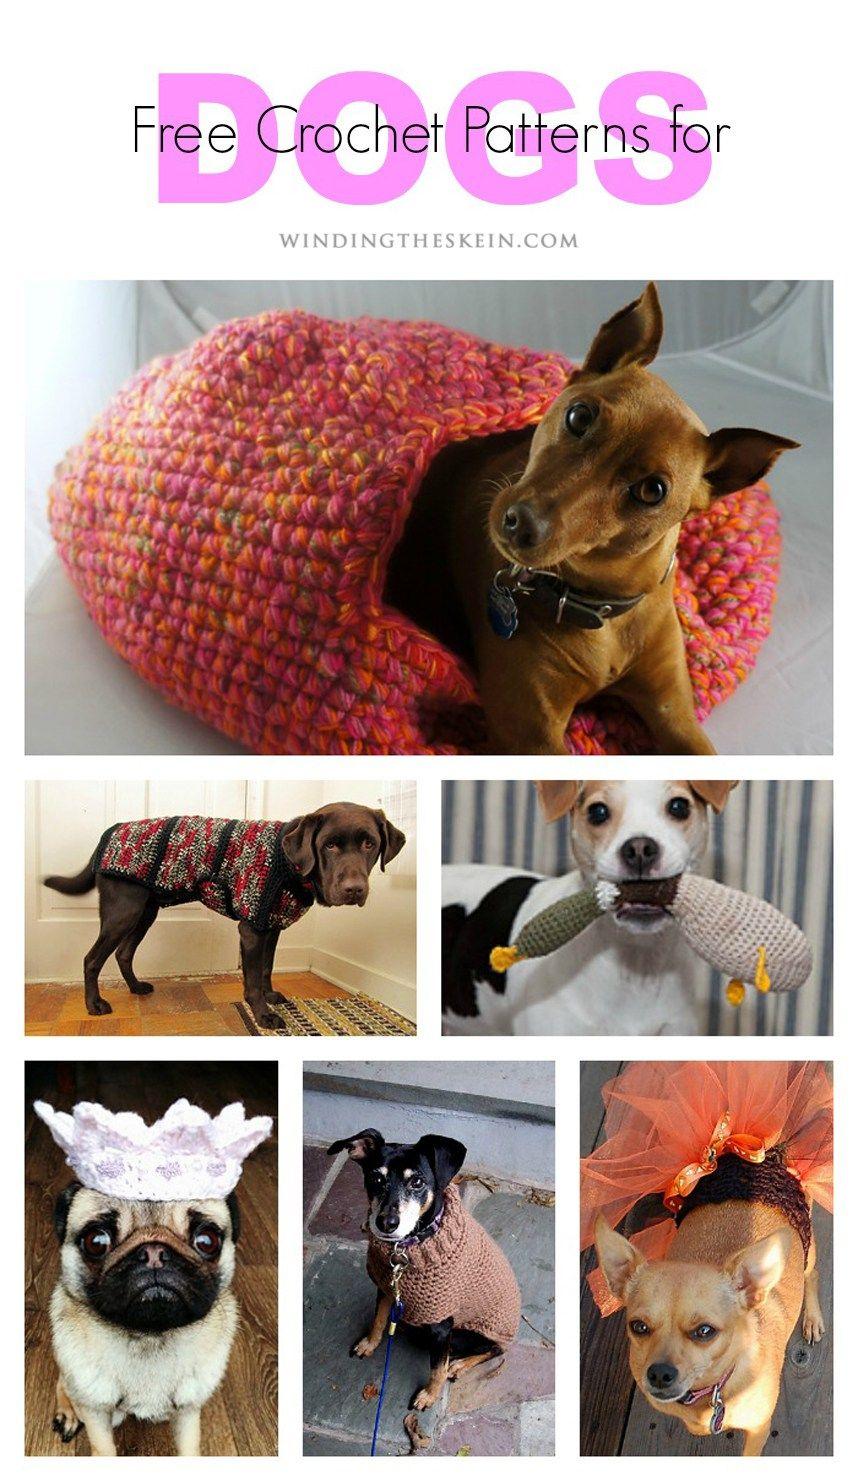 23 Free Crochet Patterns For Household Pets Crochet Dog Patterns